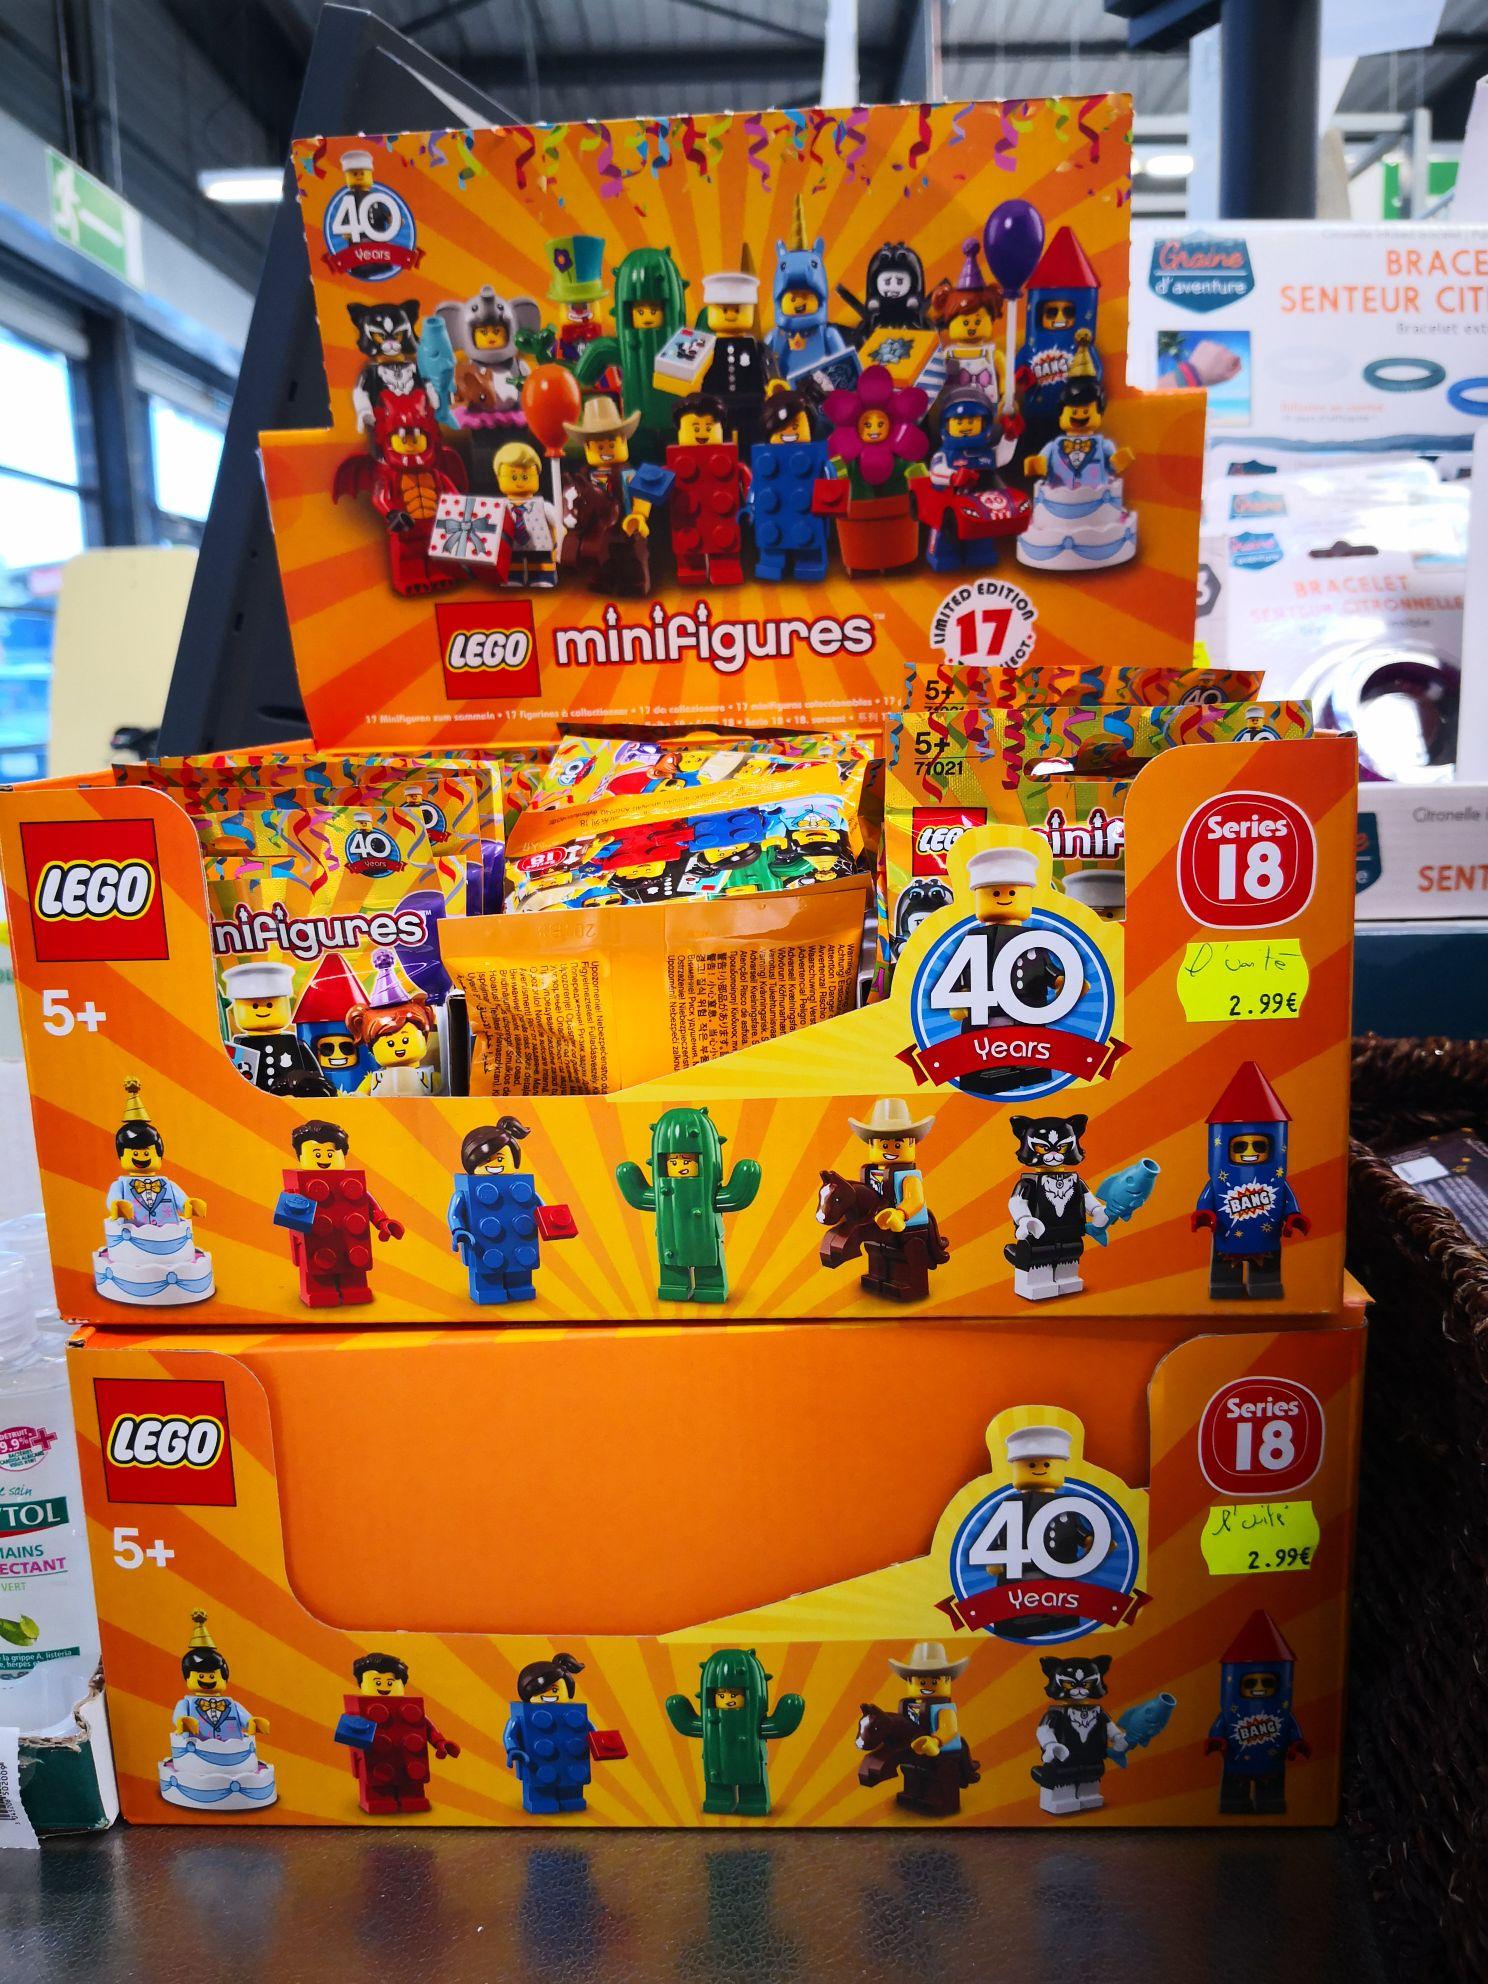 Minifigures Lego série 18 - Échirolles (38)